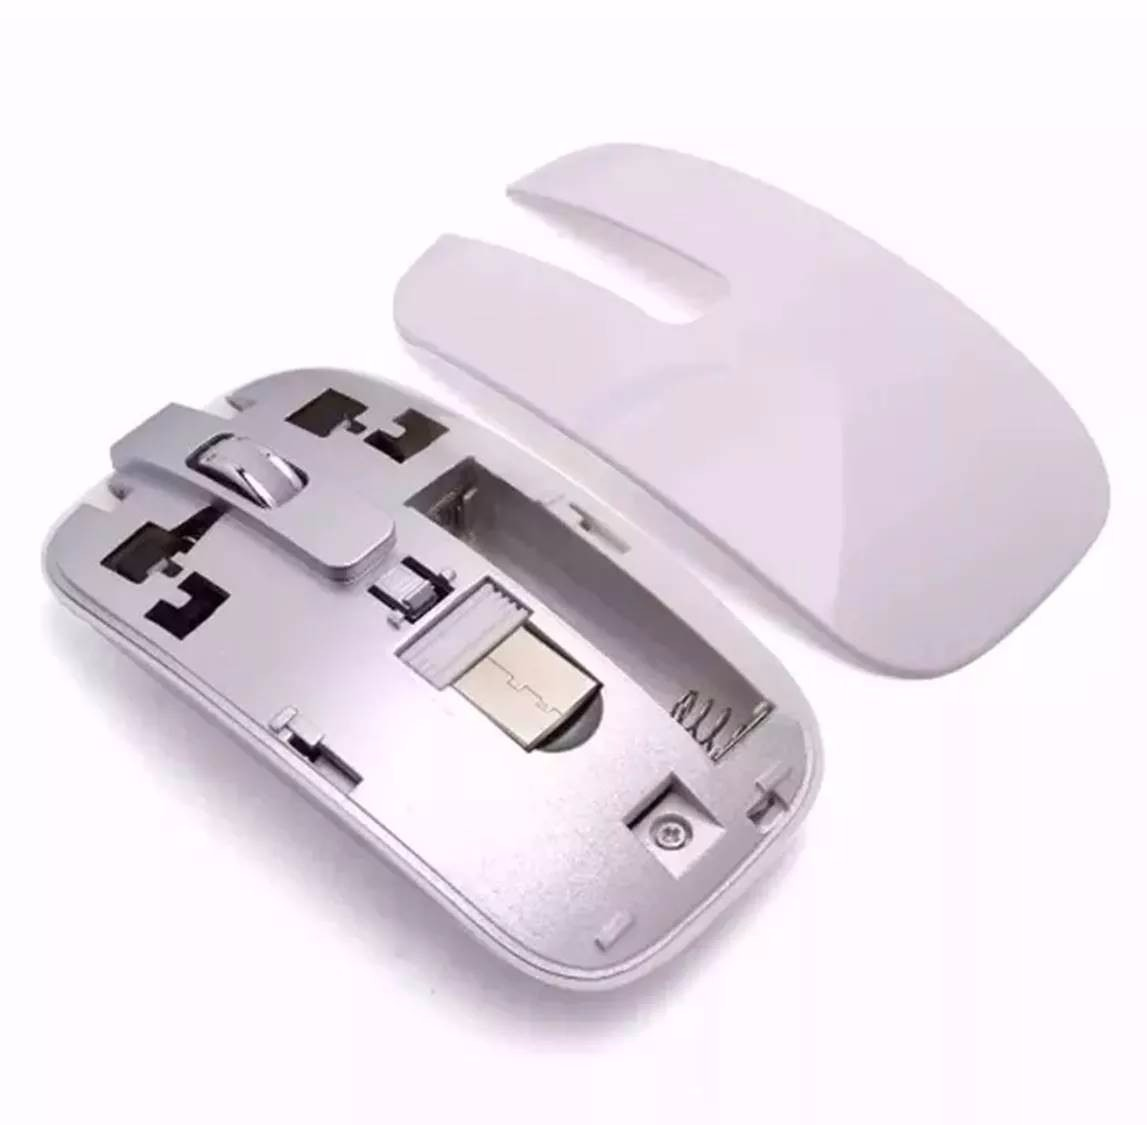 Kit Teclado + Mouse Wireless S/ Fio 320dpi Smart 2.4ghz K99 - R$ 39.49 em Mercado Livre